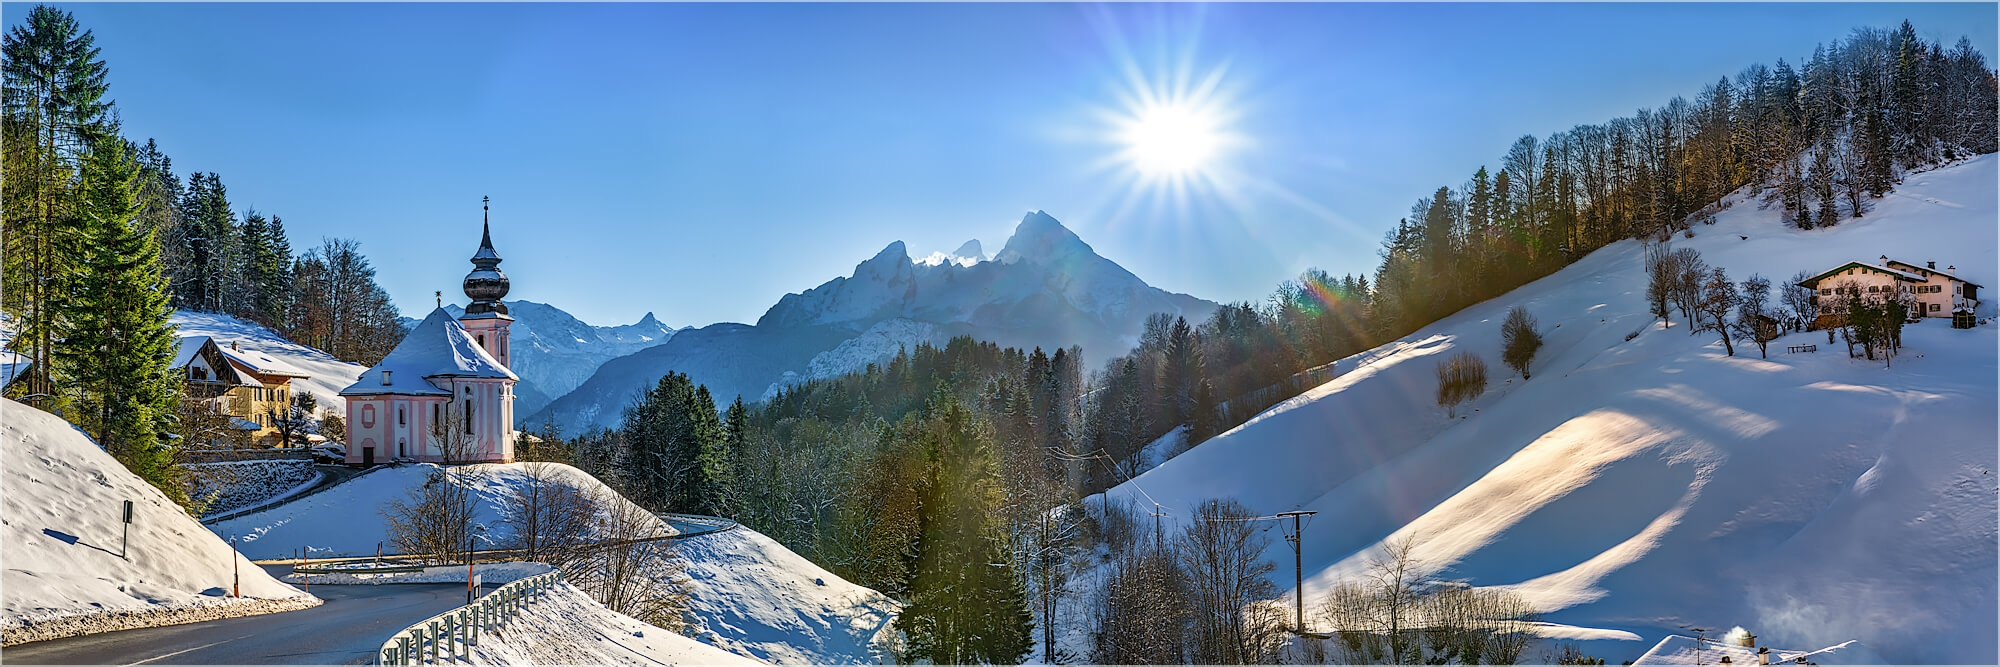 Panoramafoto Wintertag Maria Gern Berchtesgaden